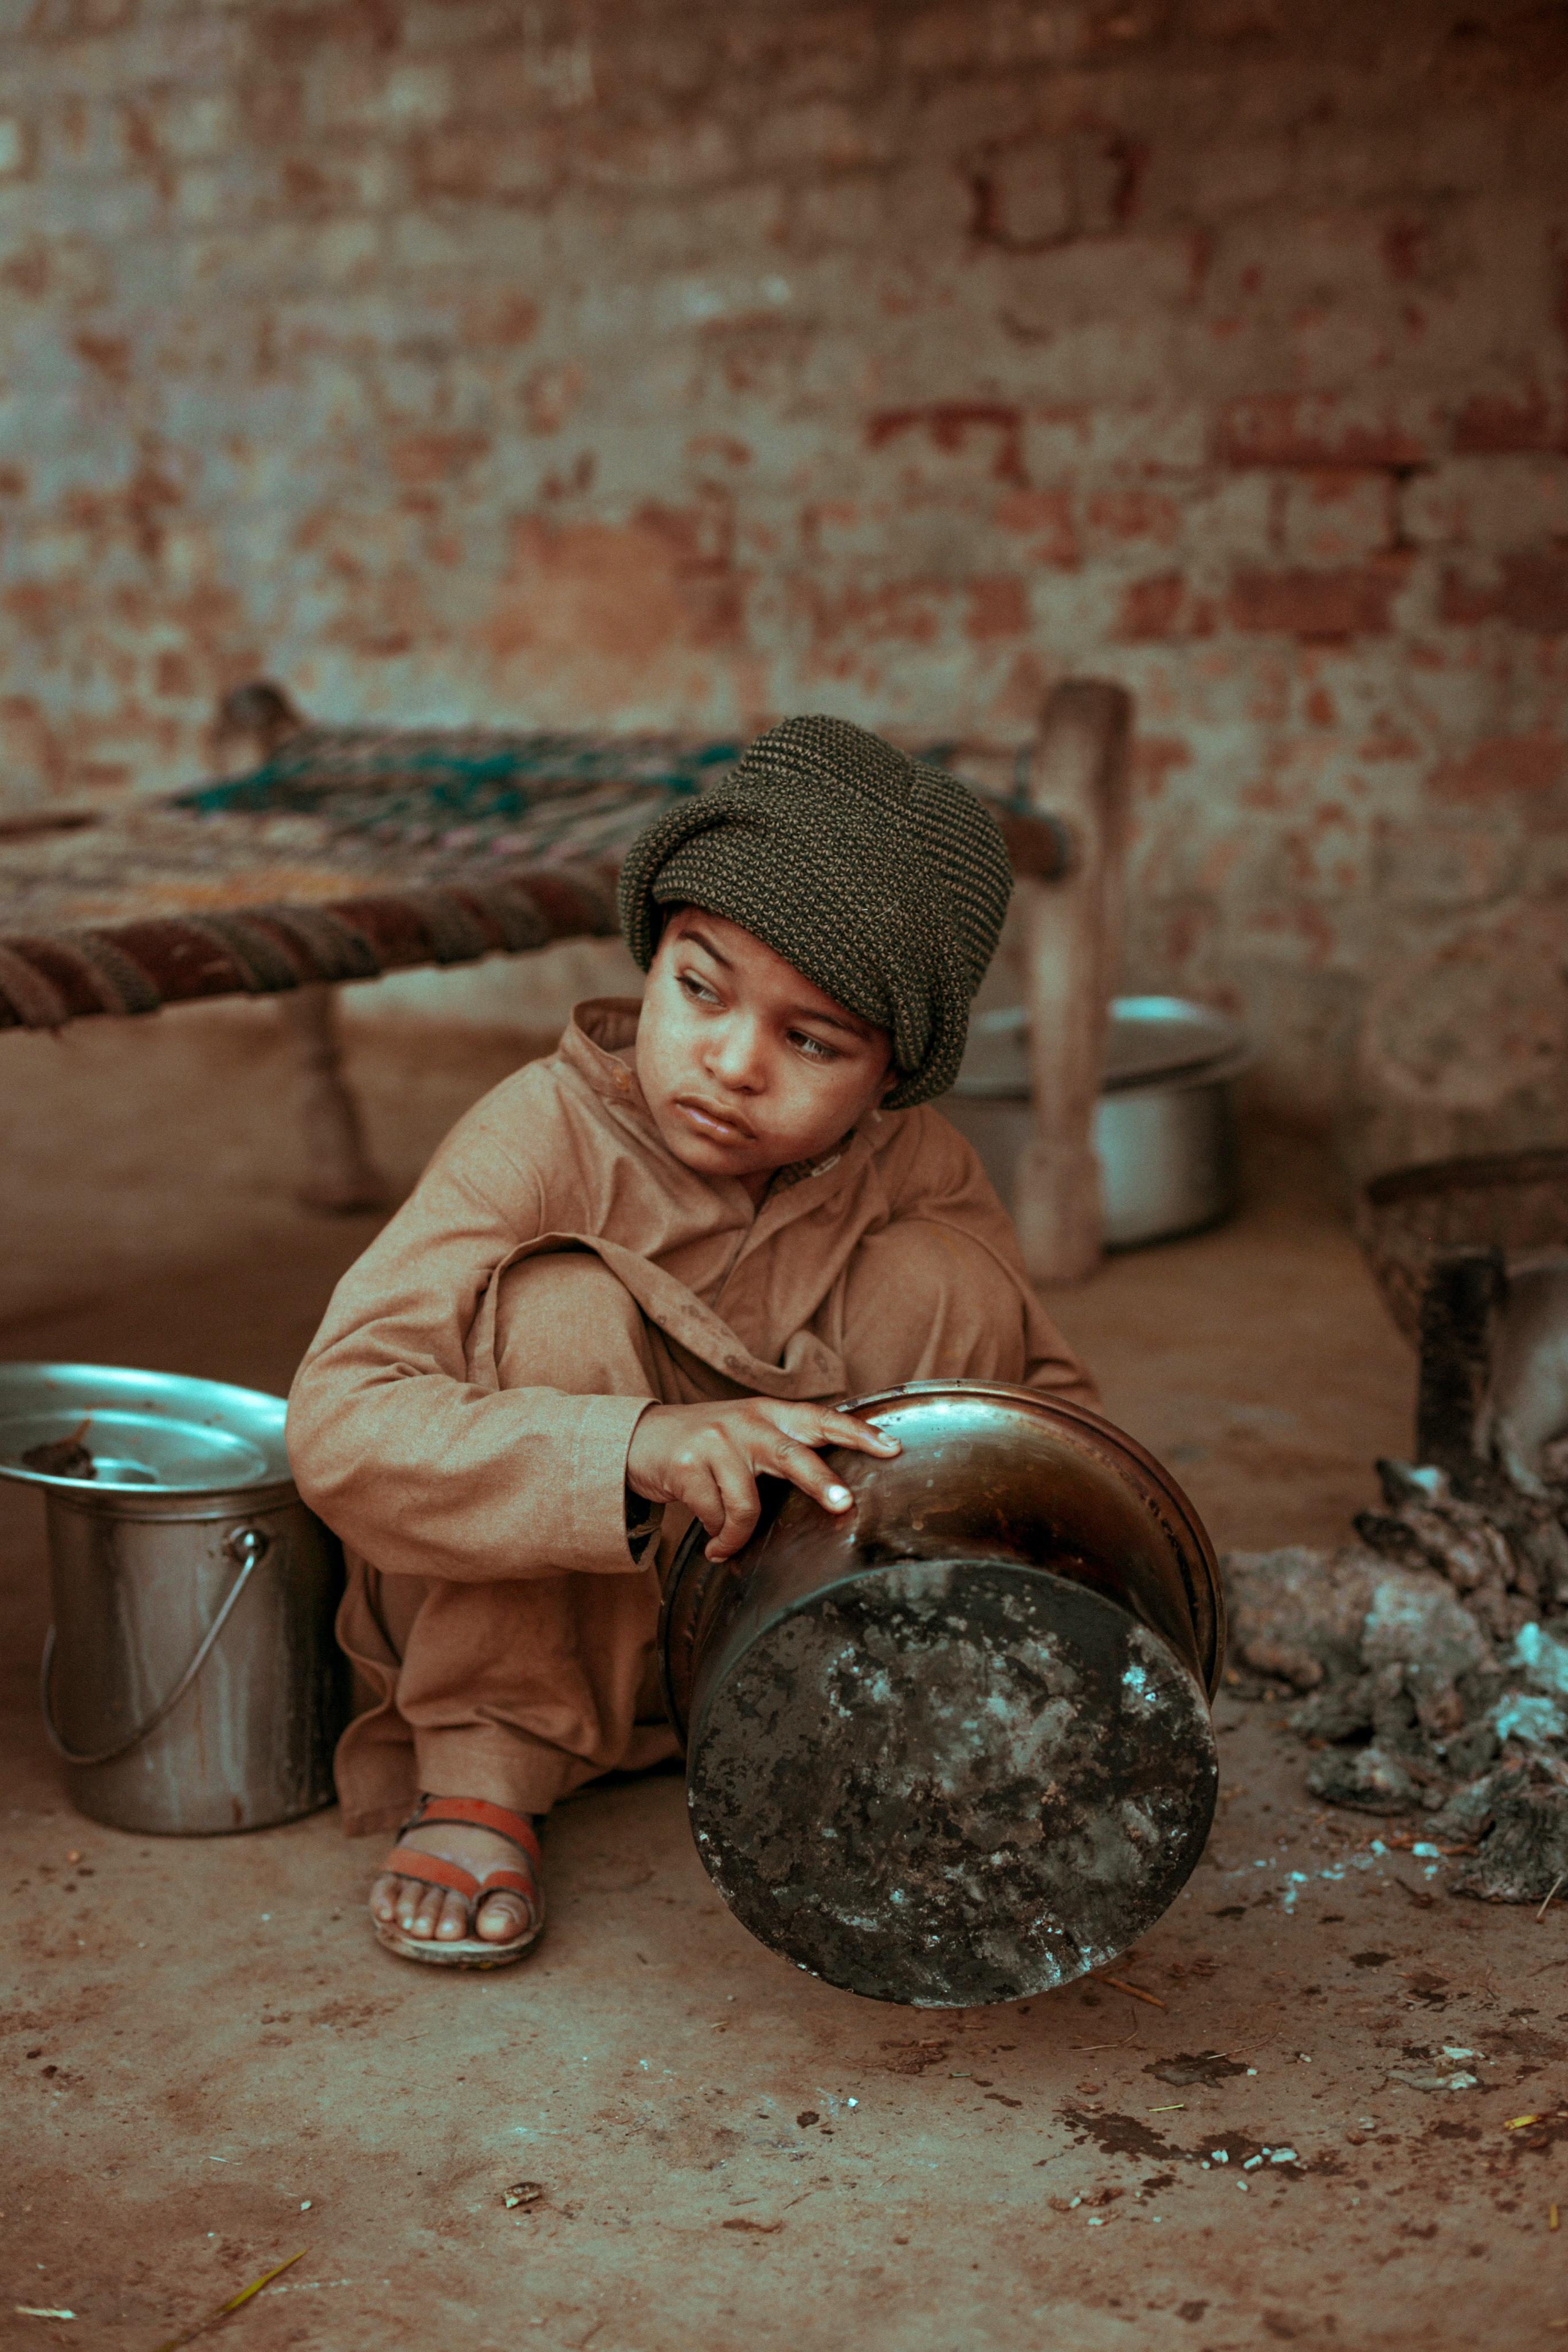 pakistan, child, unsplash, uncharted ministries